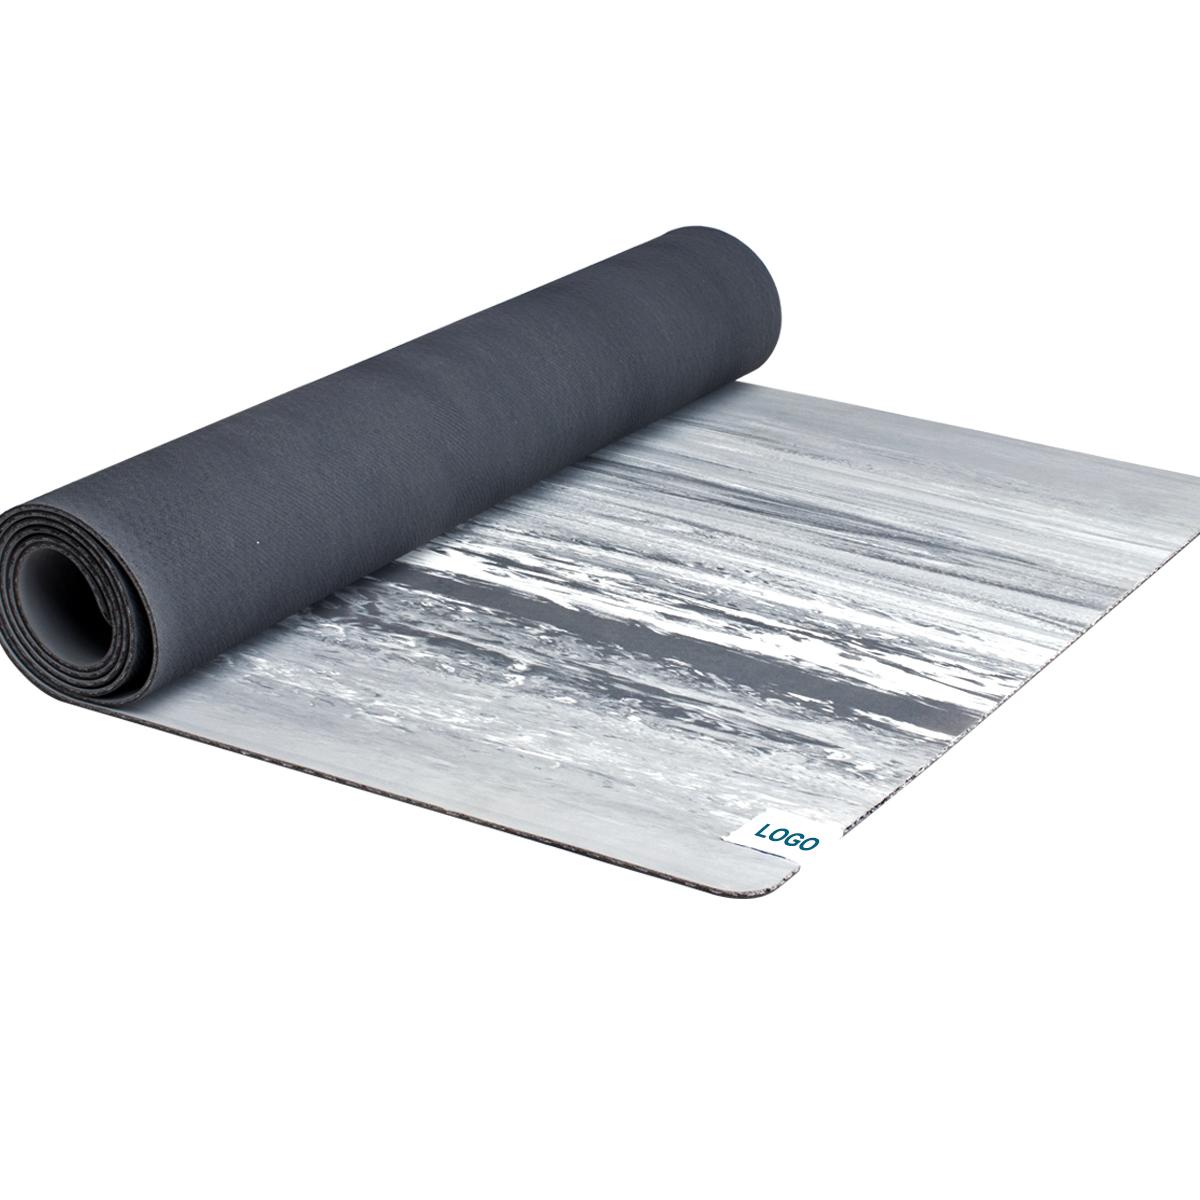 MOWIN Eco friendly non-slip pu yoga mat/natural rubber yoga mat